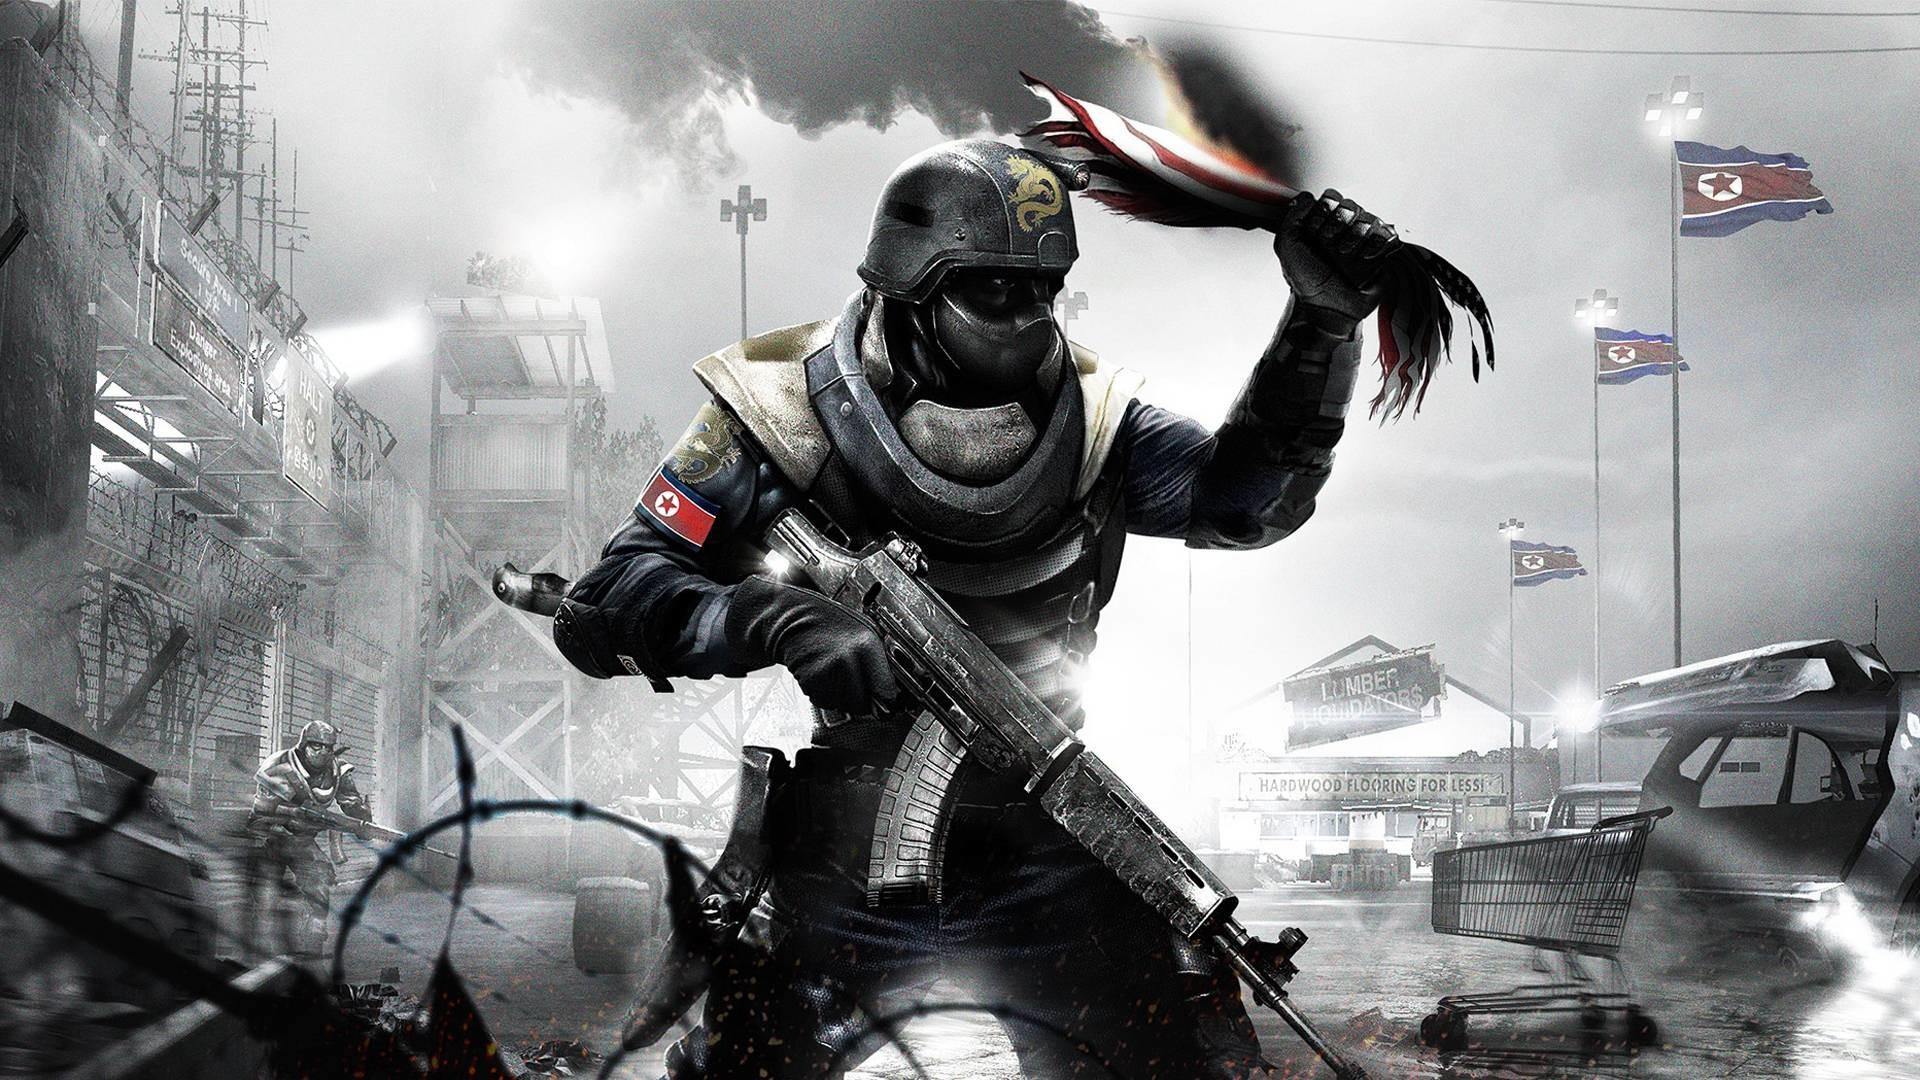 Pc Gaming Wallpaper 1080p 69 Images